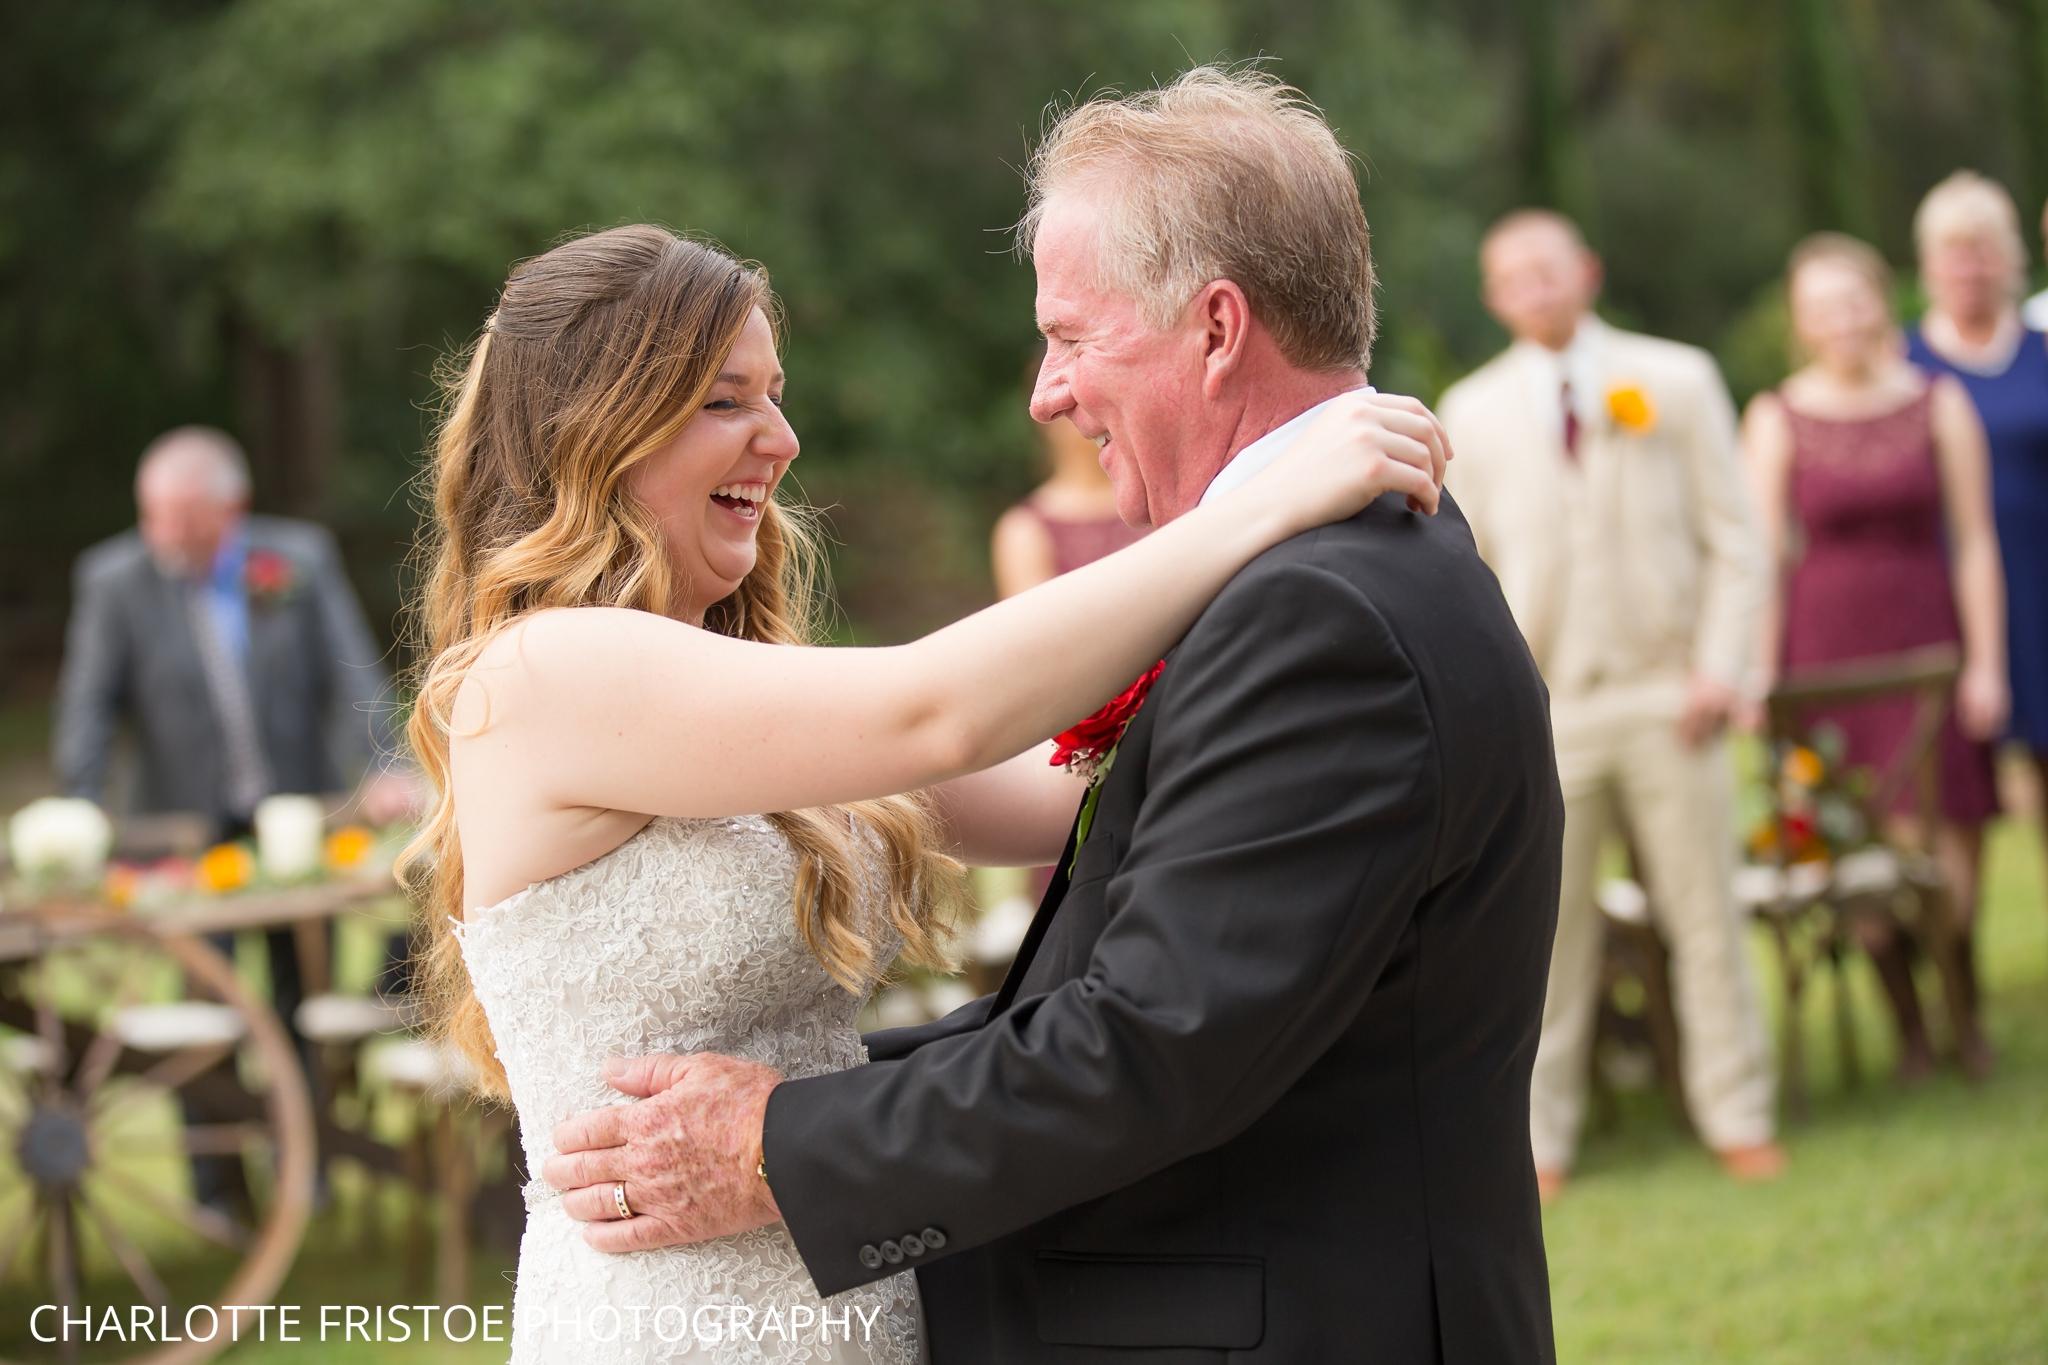 Tallahassee_Wedding_Charlotte_Fristoe-72.jpg